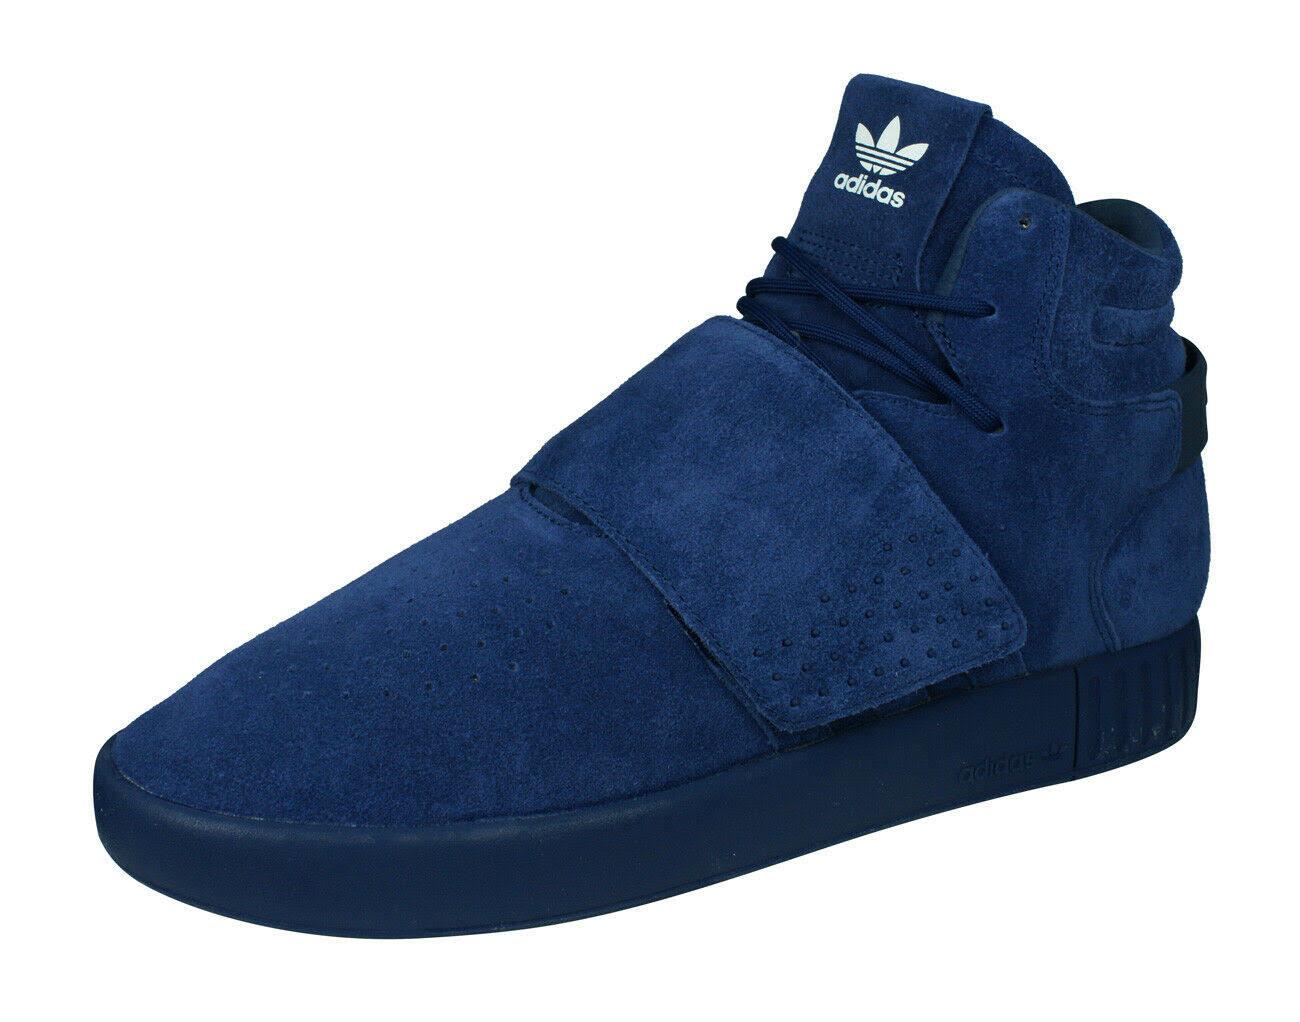 (3.5) Adidas Originals Tubular Invader Strap Mens Hi Top Trainers sneakers Shoes